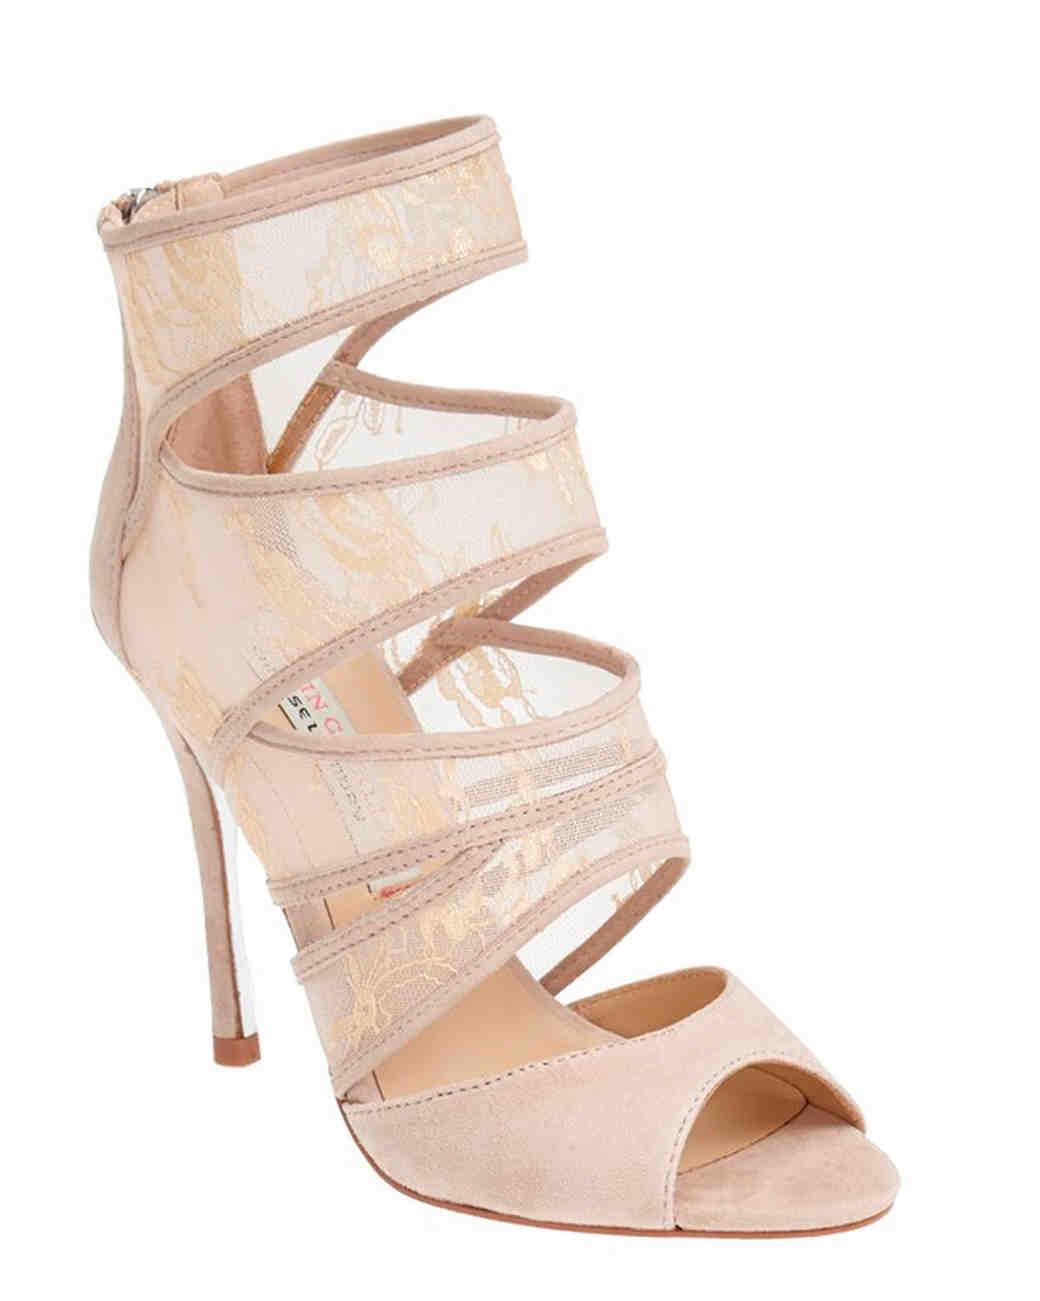 summer-wedding-shoes-kristin-cavallari-leah-sandal-0515.jpg